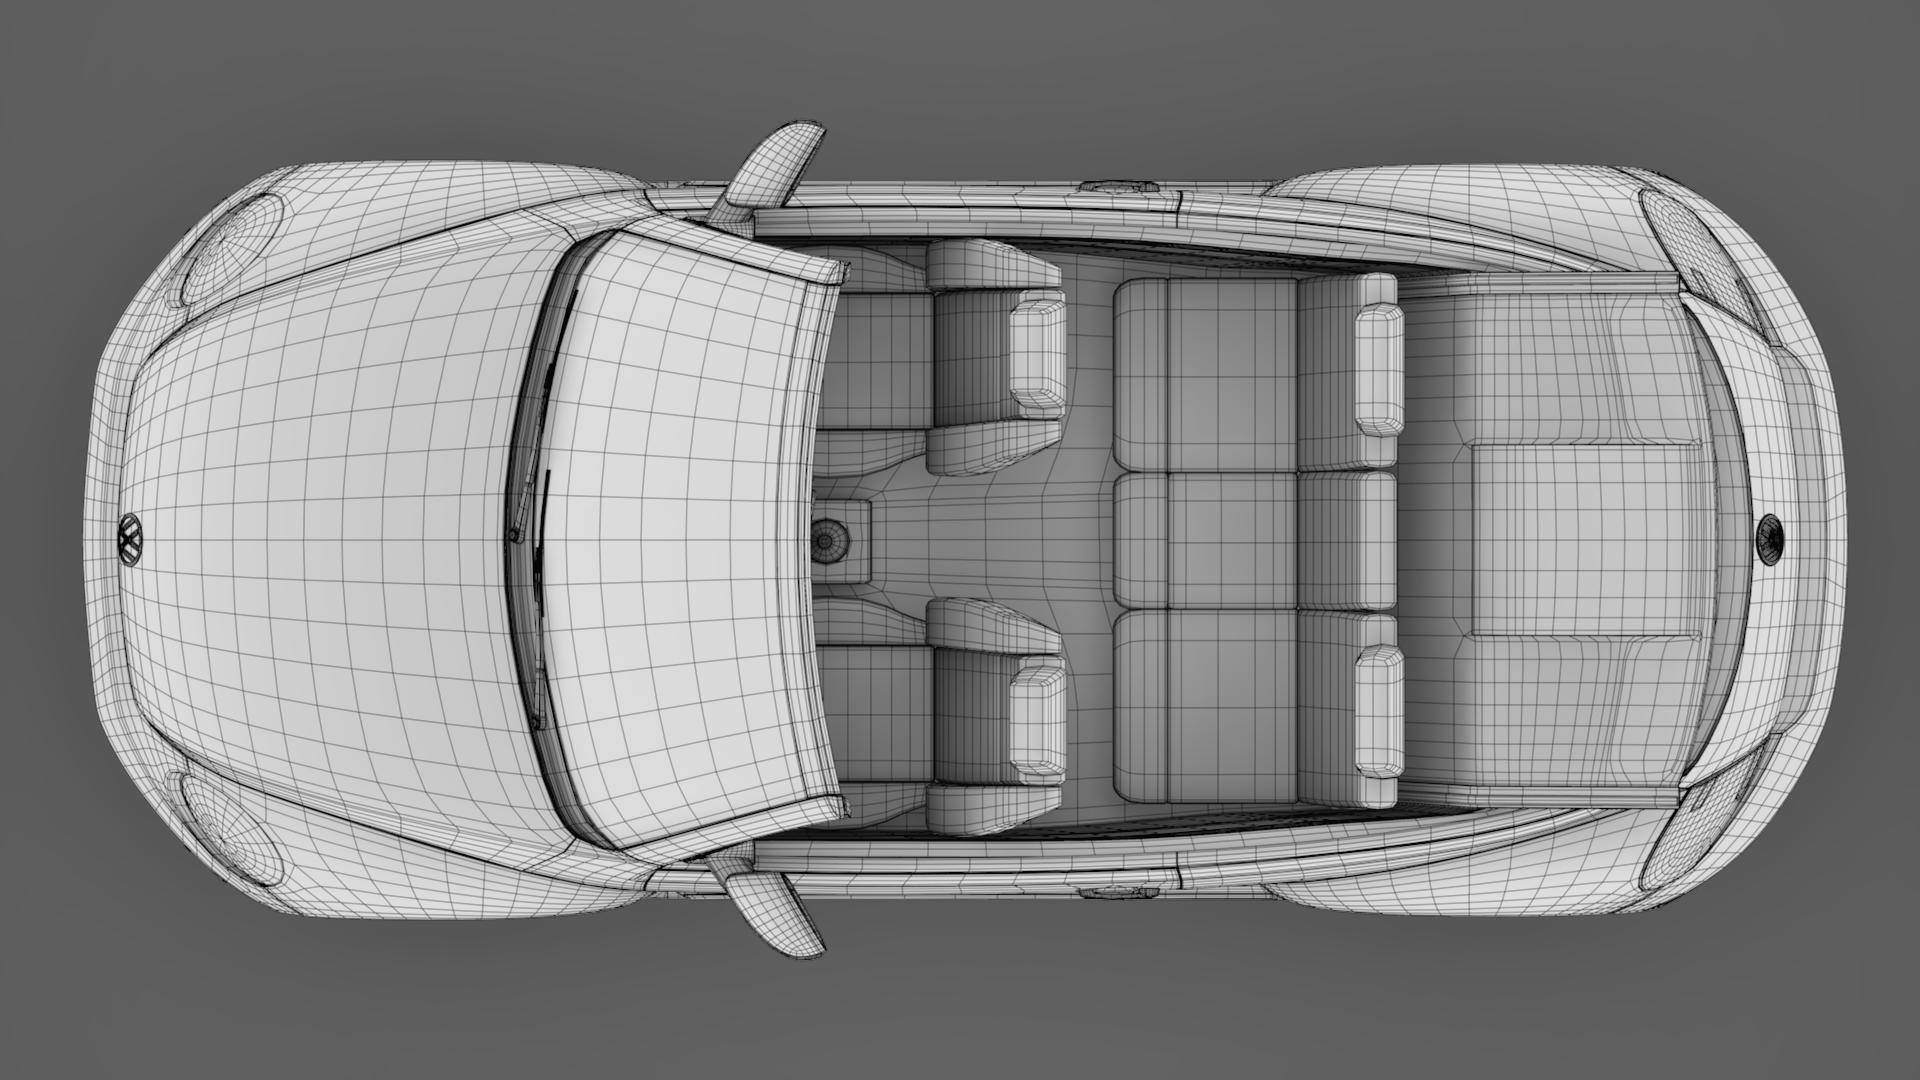 vw beetle cabriolet 2017 3d model 3ds max fbx c4d lwo ma mb hrc xsi obj 221611